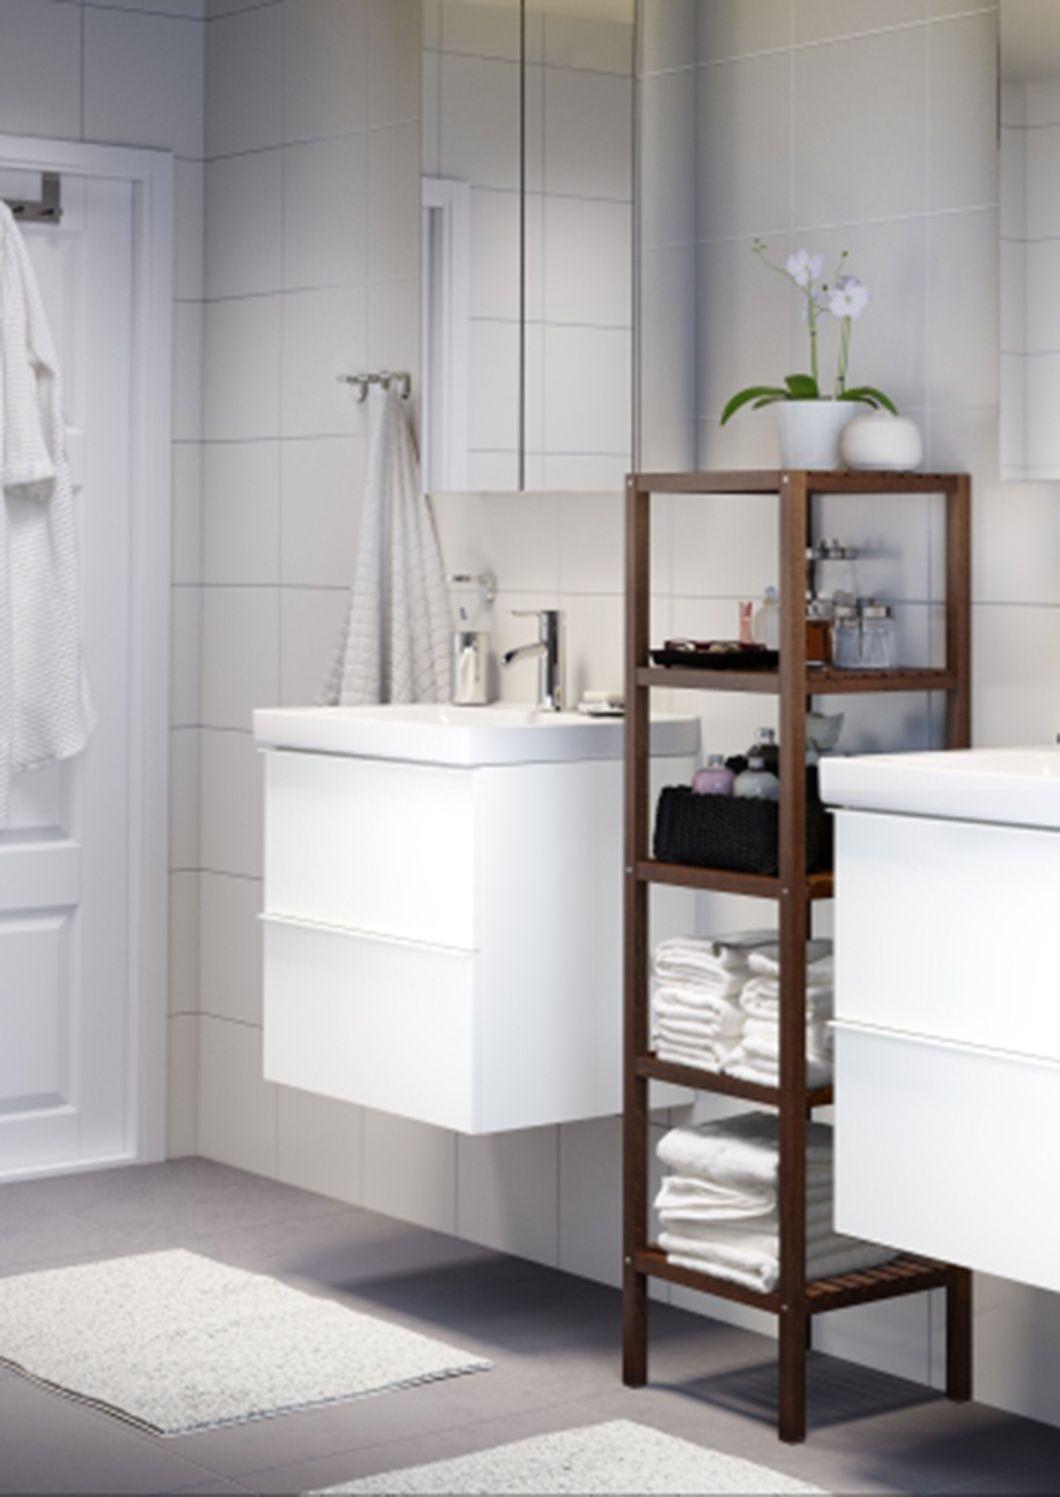 Bathroom Furniture Ideas Ikea Ikea Bathroom Diy Bathroom Remodel Bathrooms Remodel